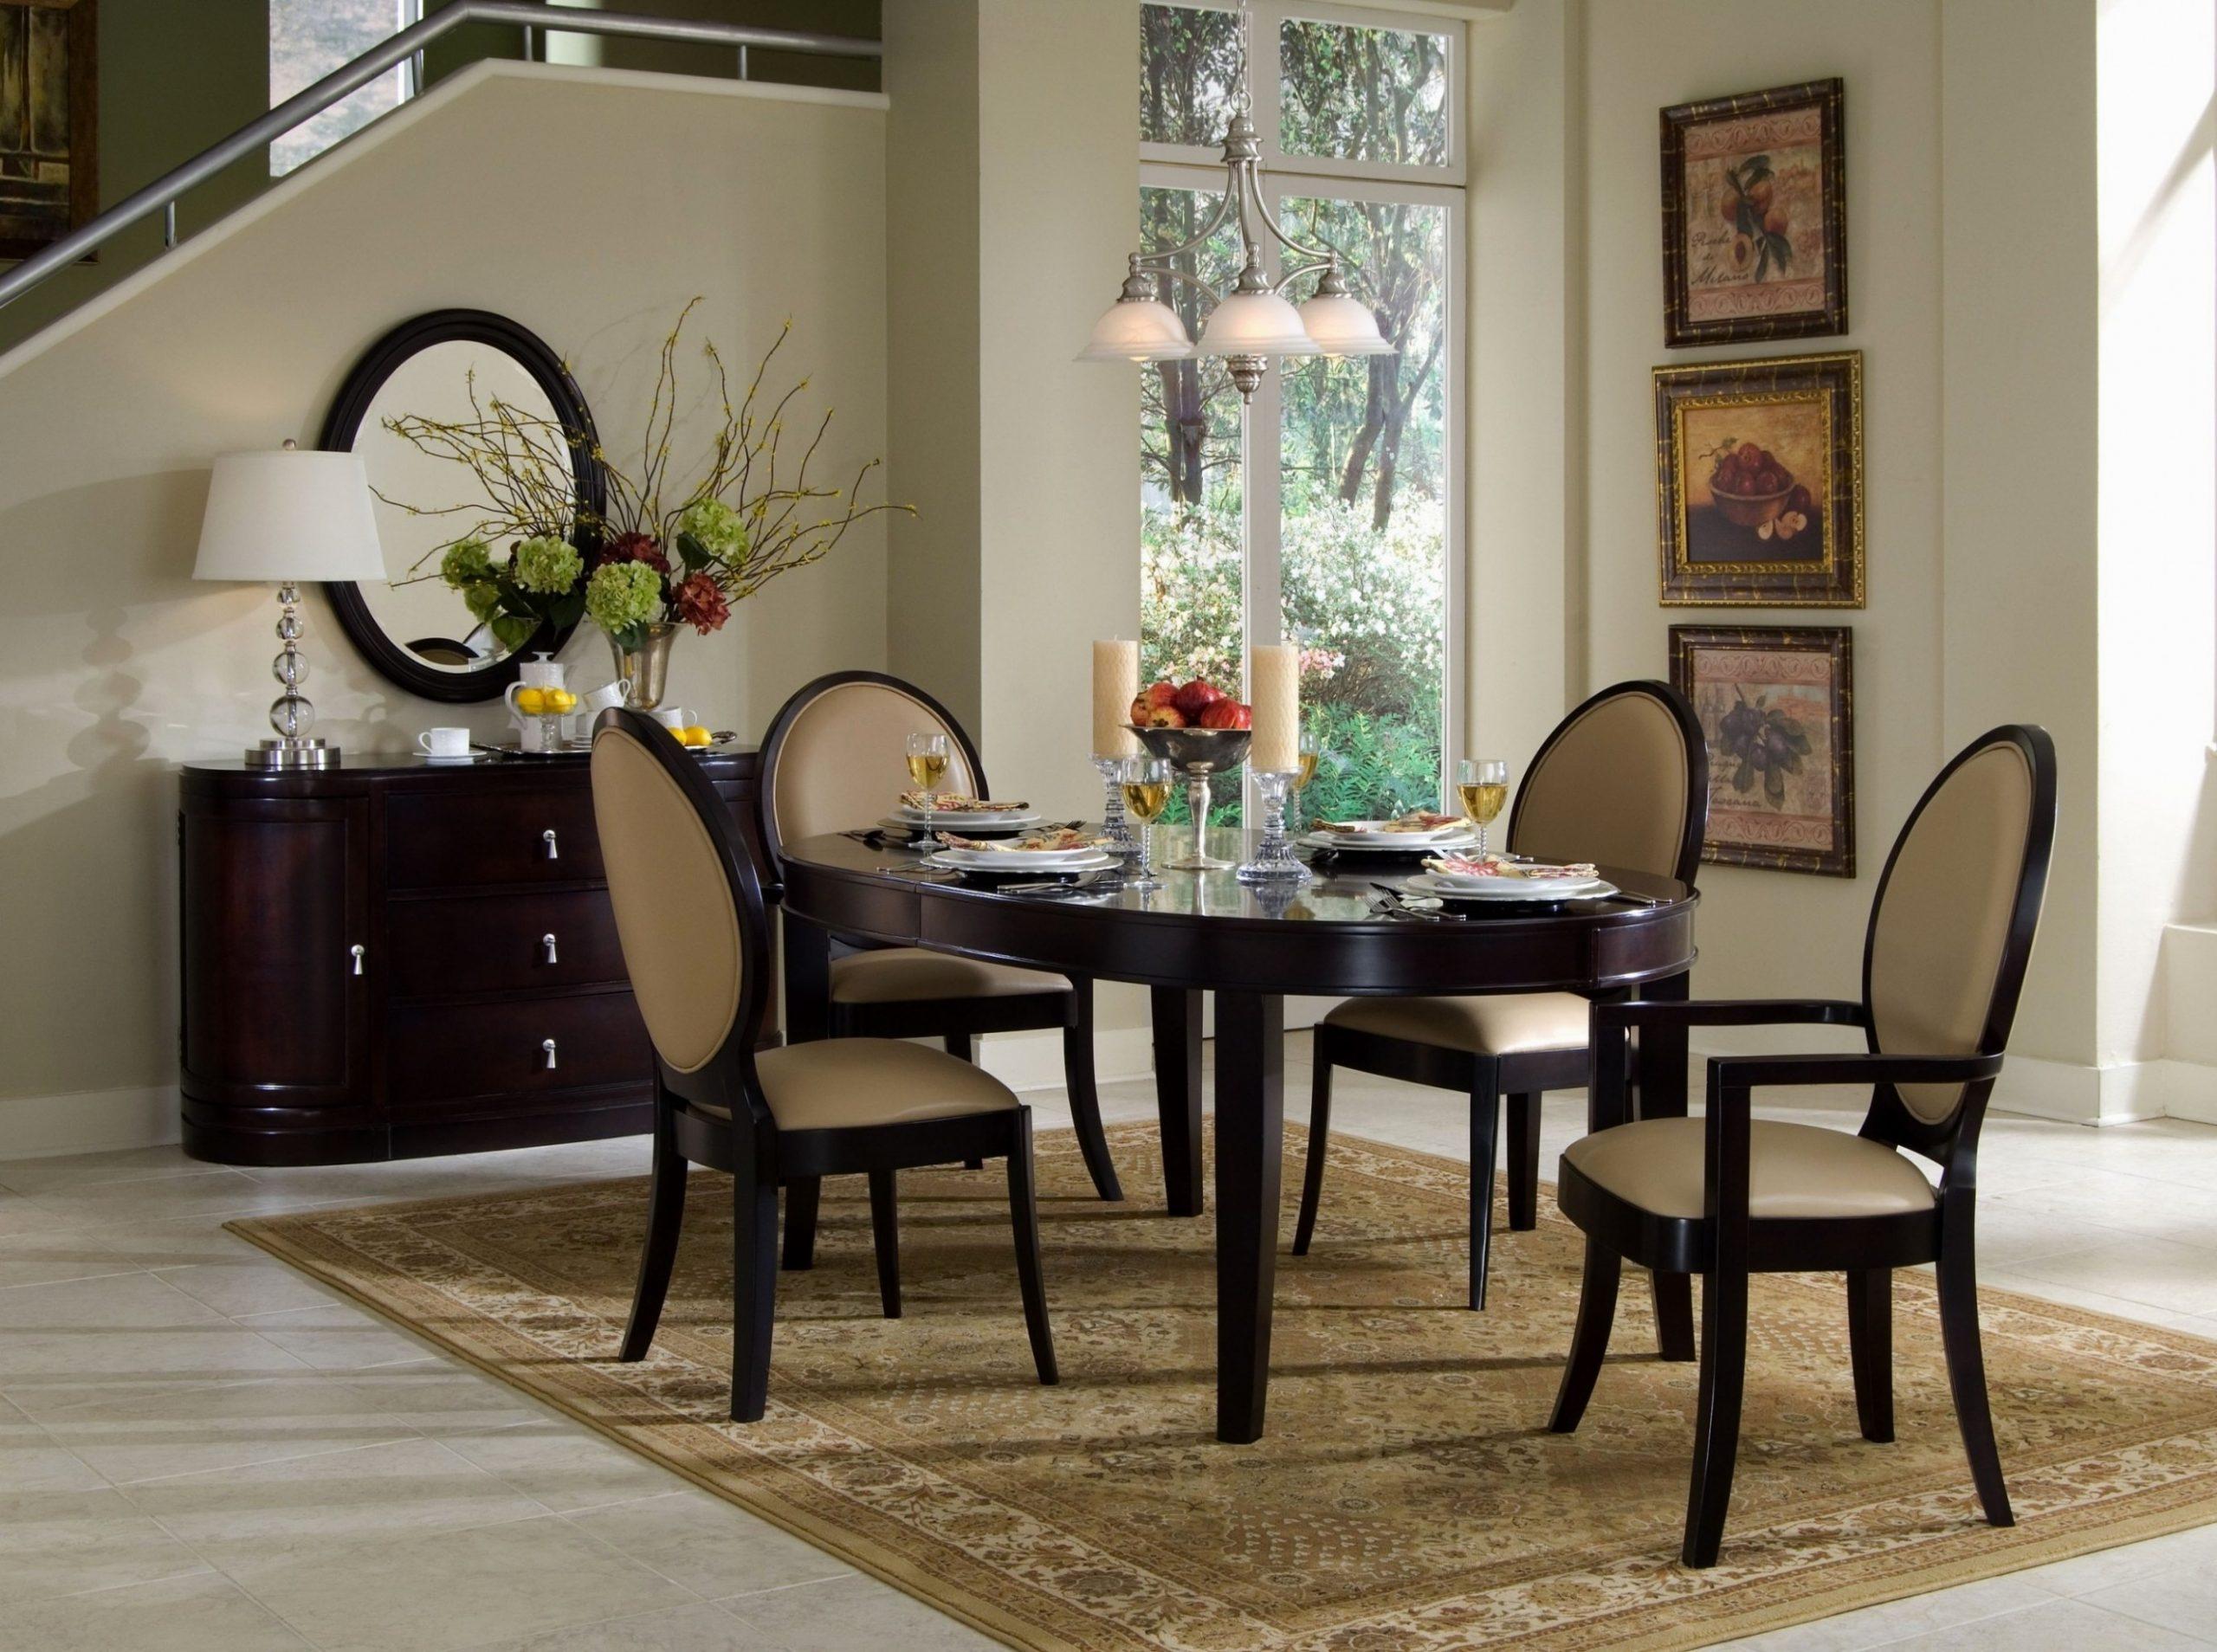 Rugs Showcase Power Dining Table – Saltandblues - 12 X 12 Dining Room Ideas